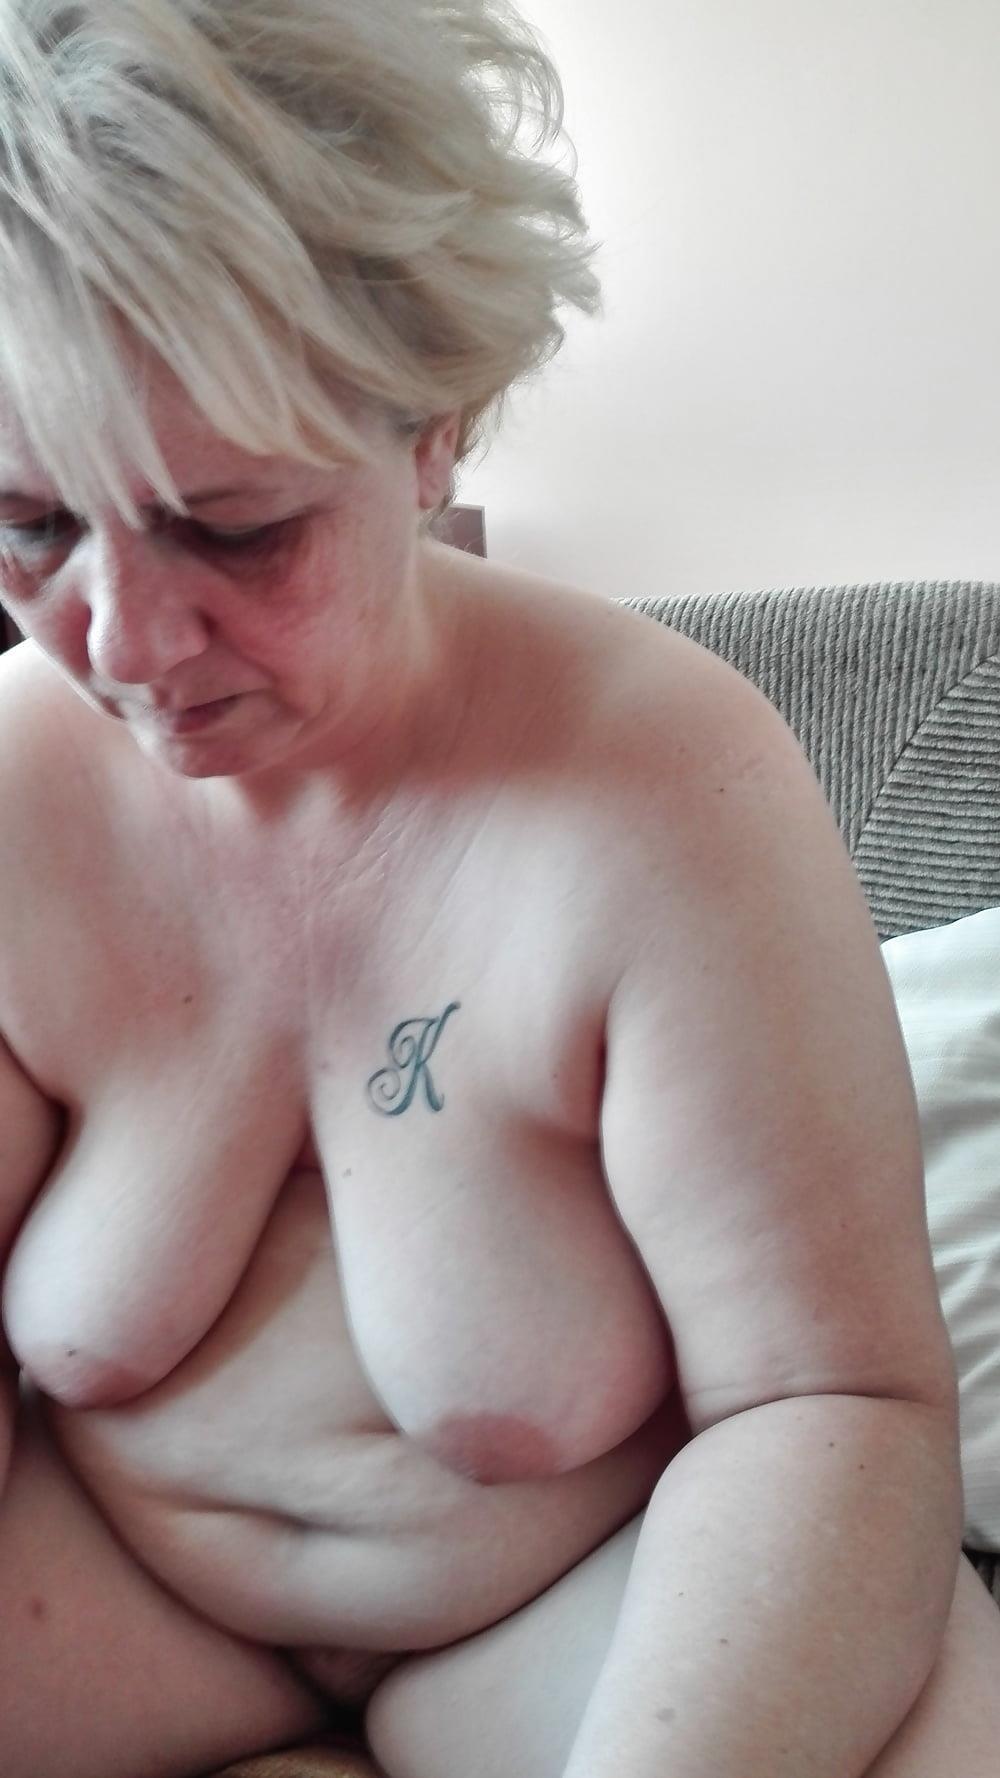 Big tits creampie pics-8453